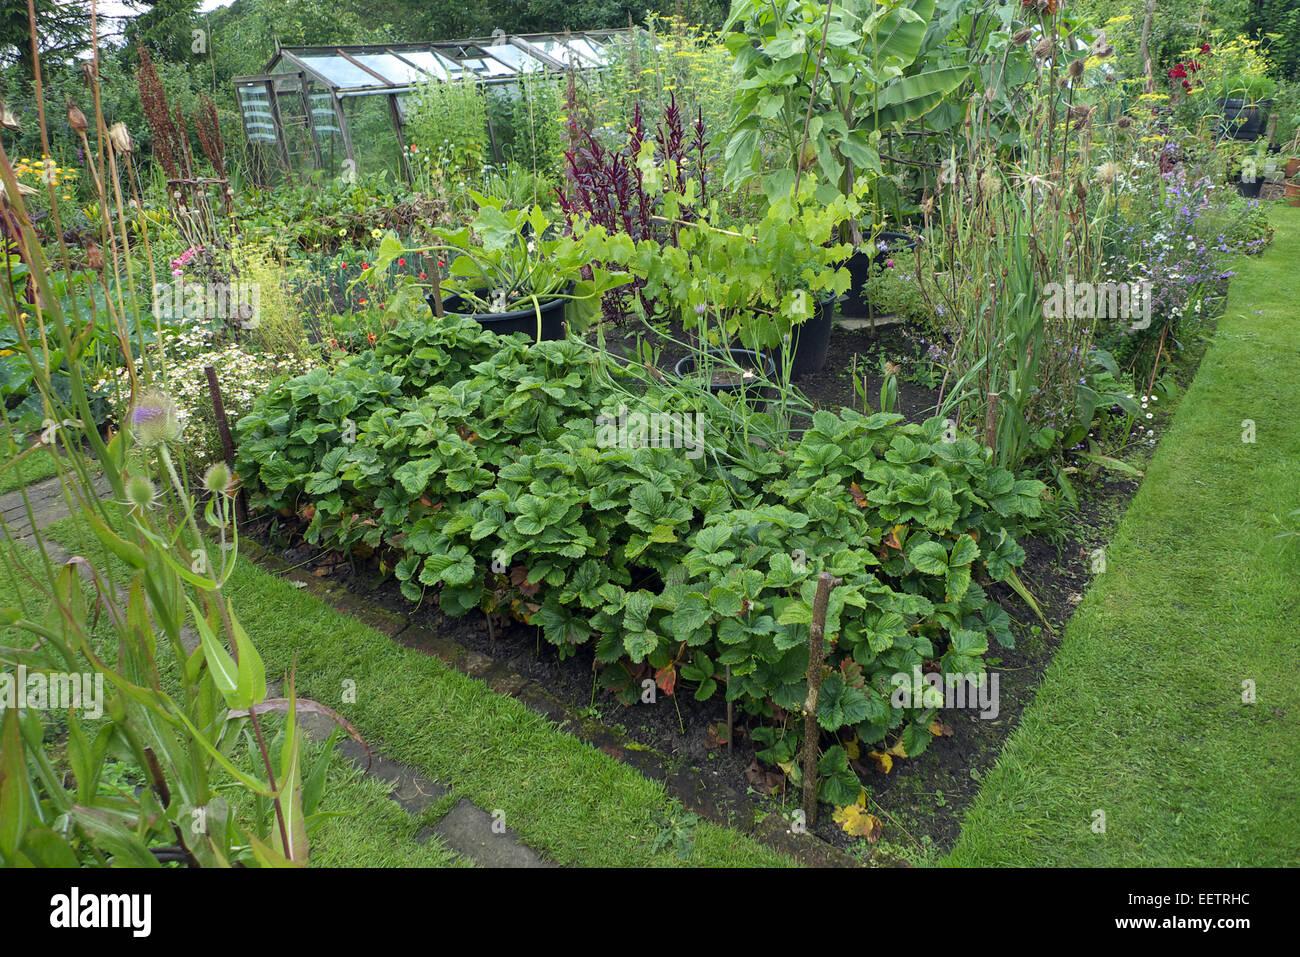 Ornamental organic kitchen garden, Cheshire, UK - Stock Image